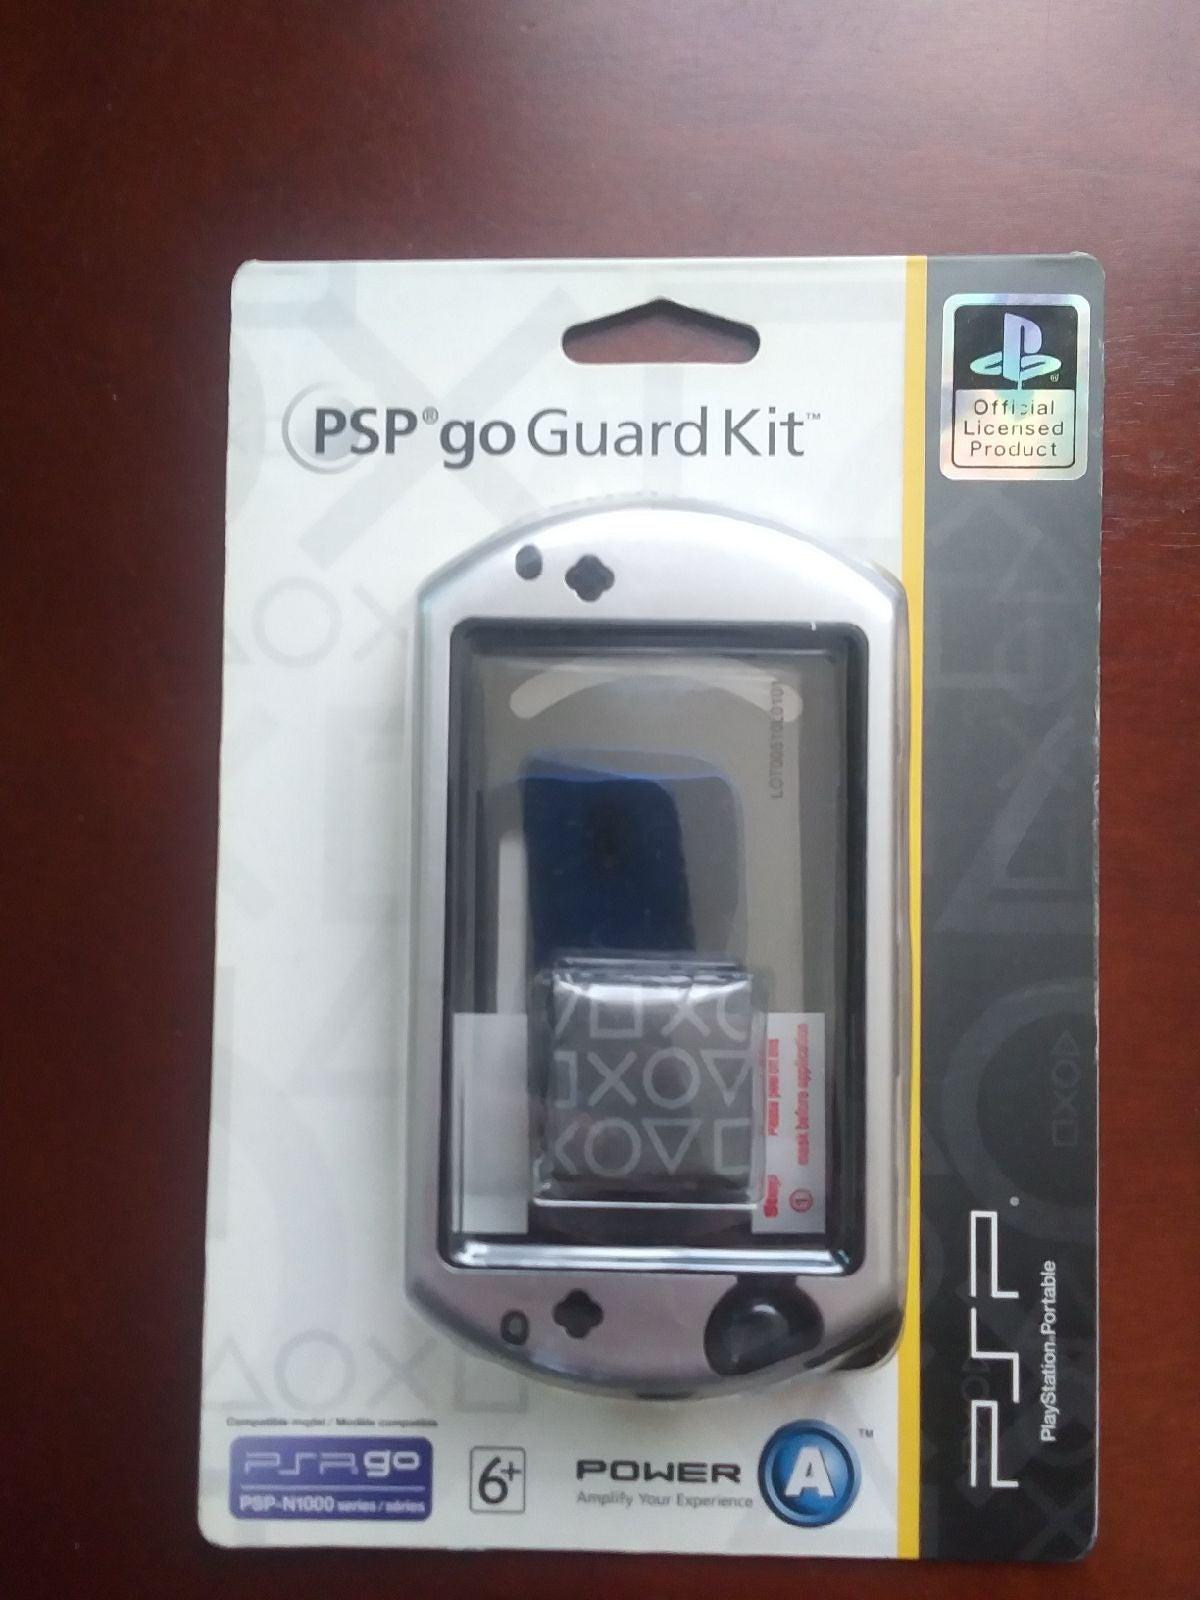 Psp go guard kit